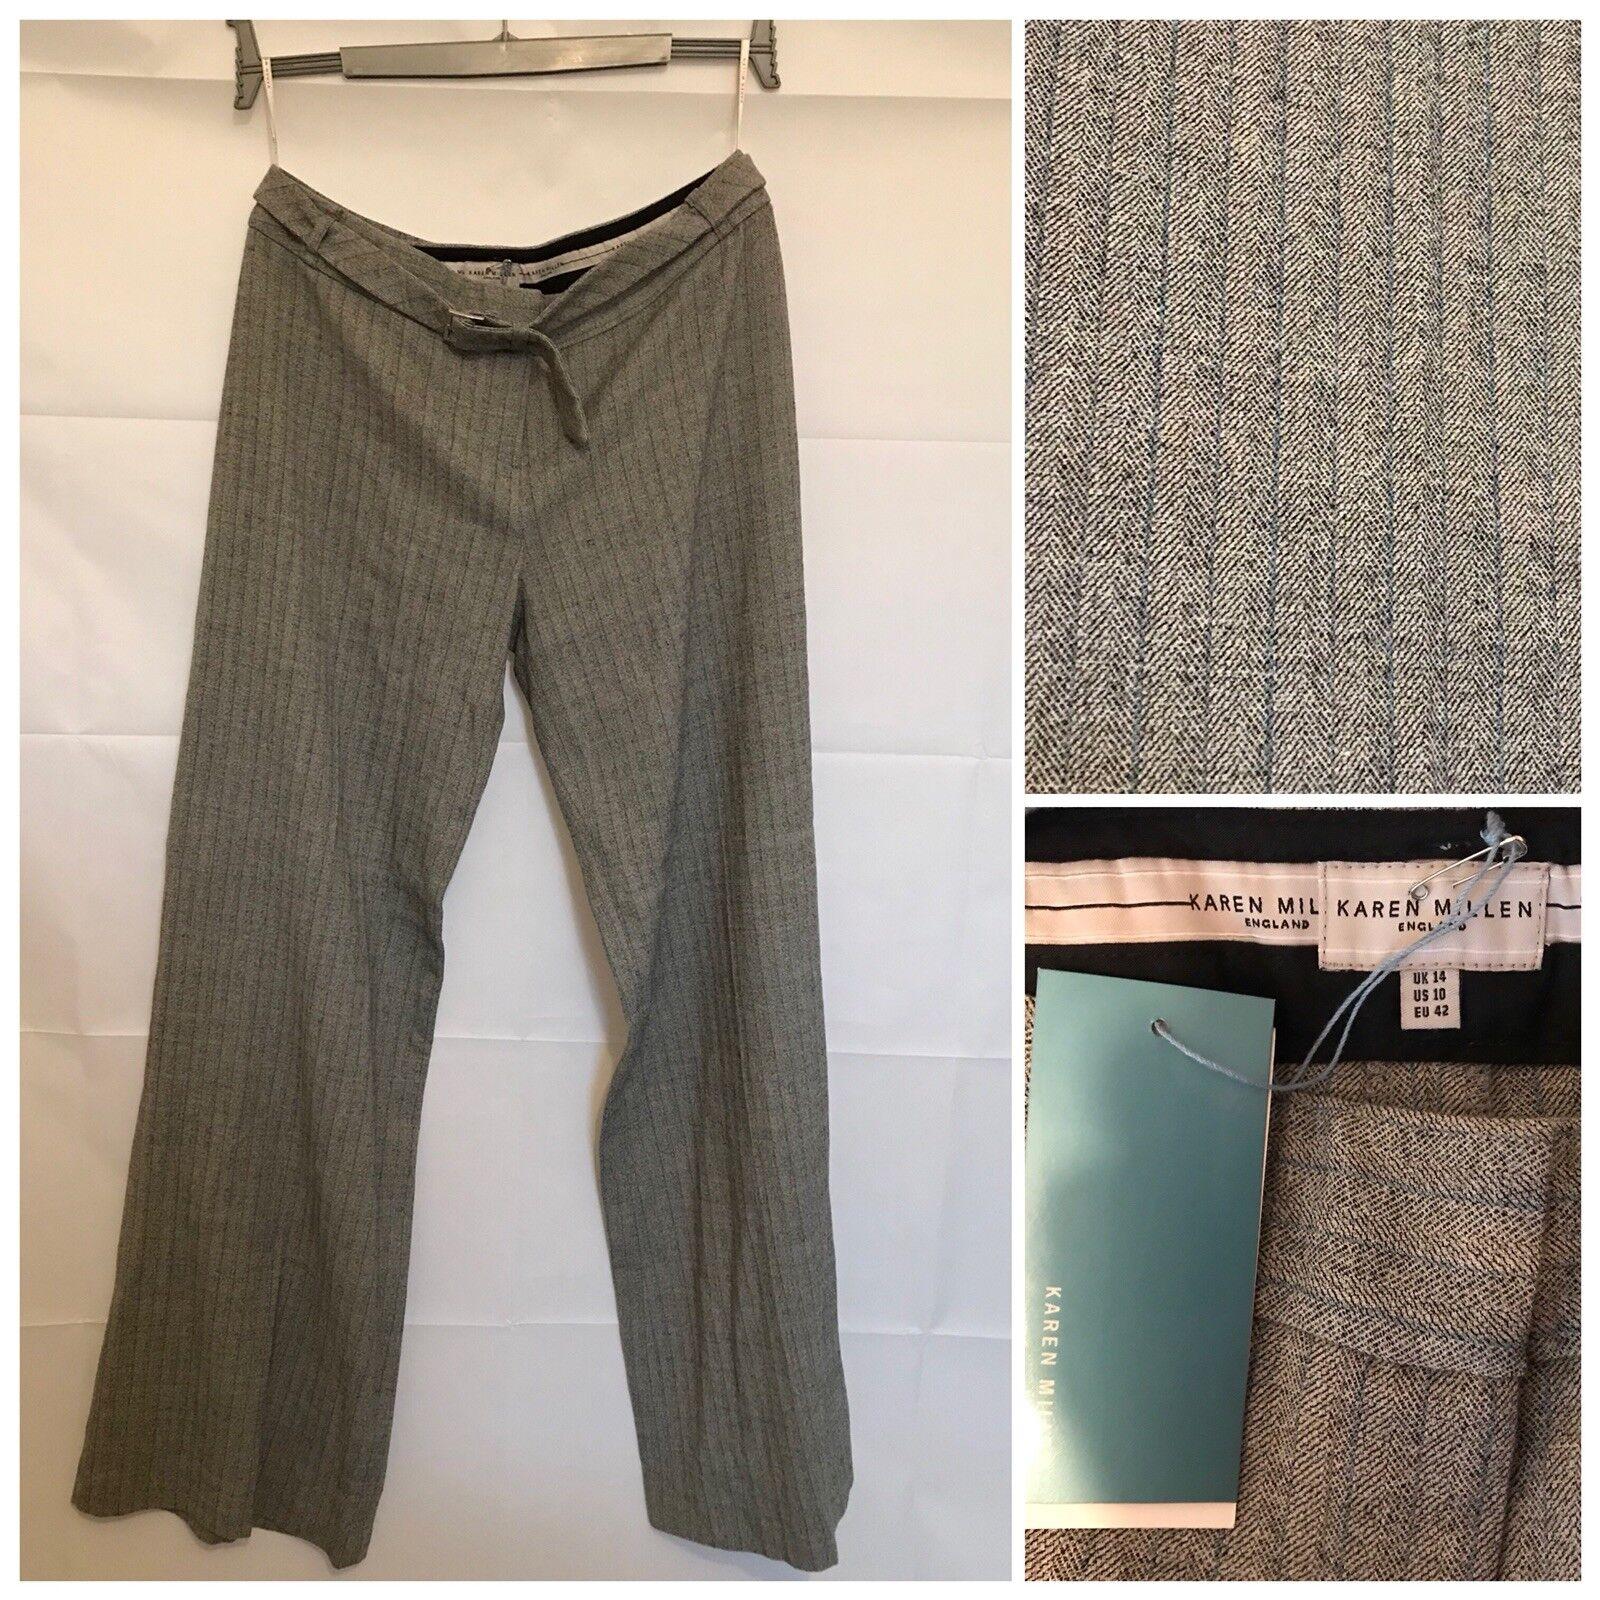 Karen Millen Trousers Größe 14 braun grau Wool Warm Straight Leg Brand New Tags